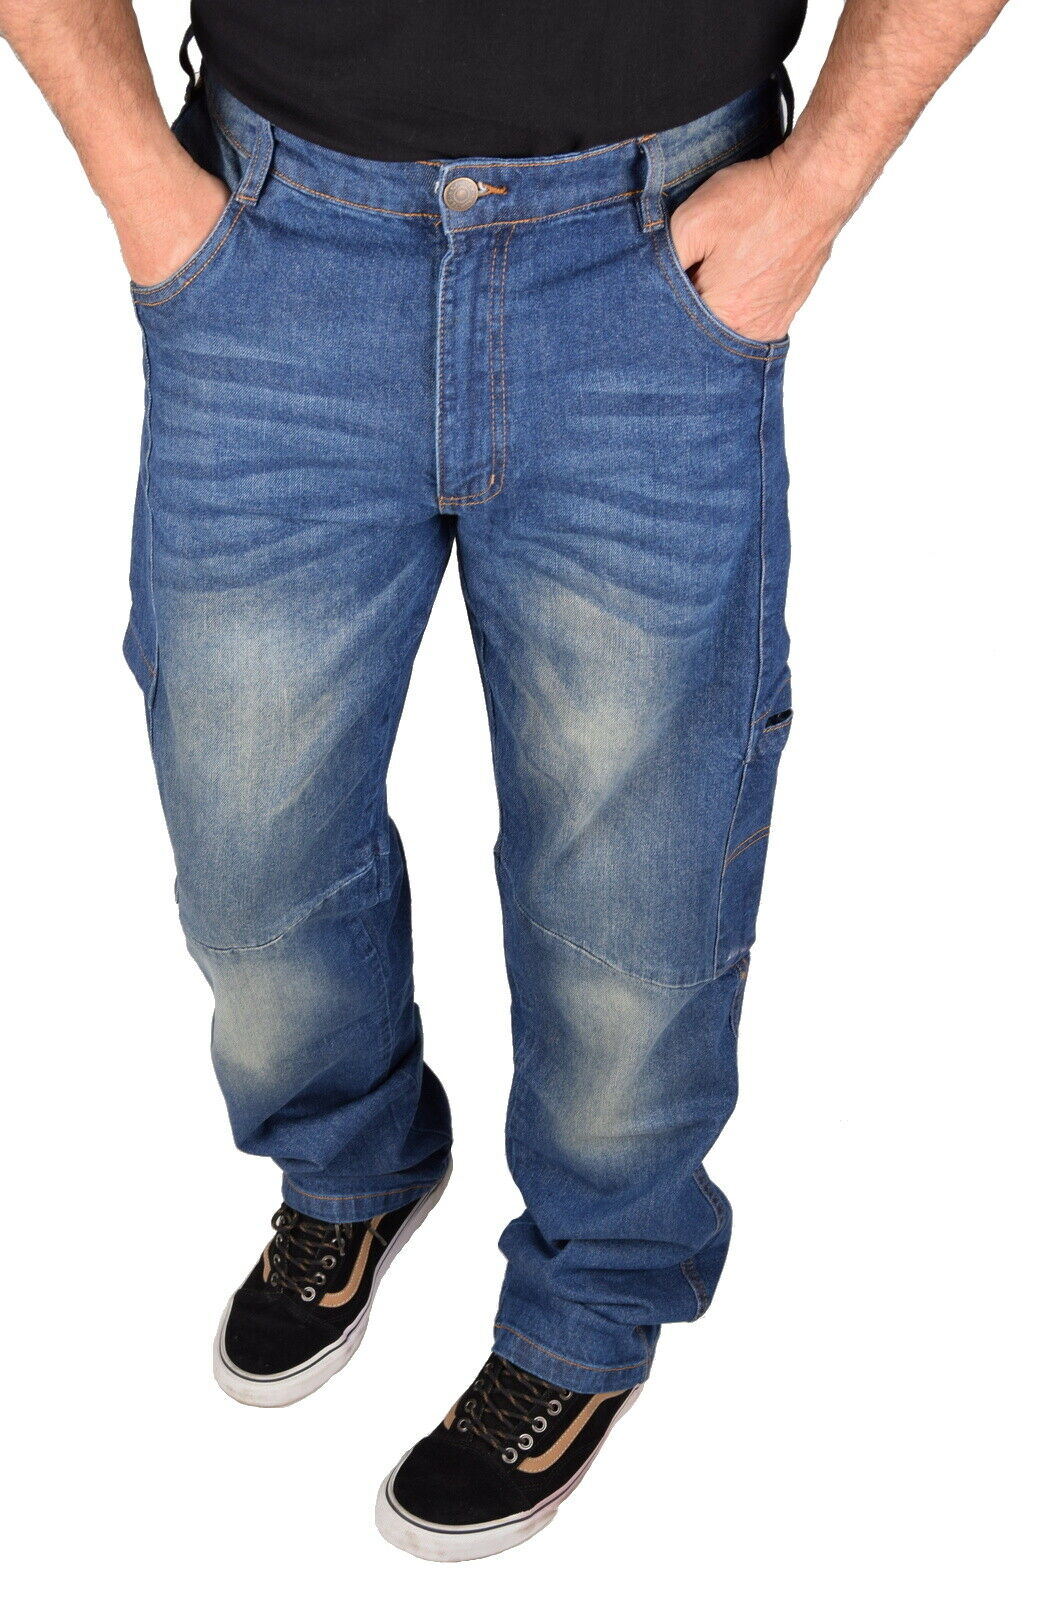 Stabile Herren Jeans Arbeitshose Bundhose Berufshose Workwear Stretch Denim Blau